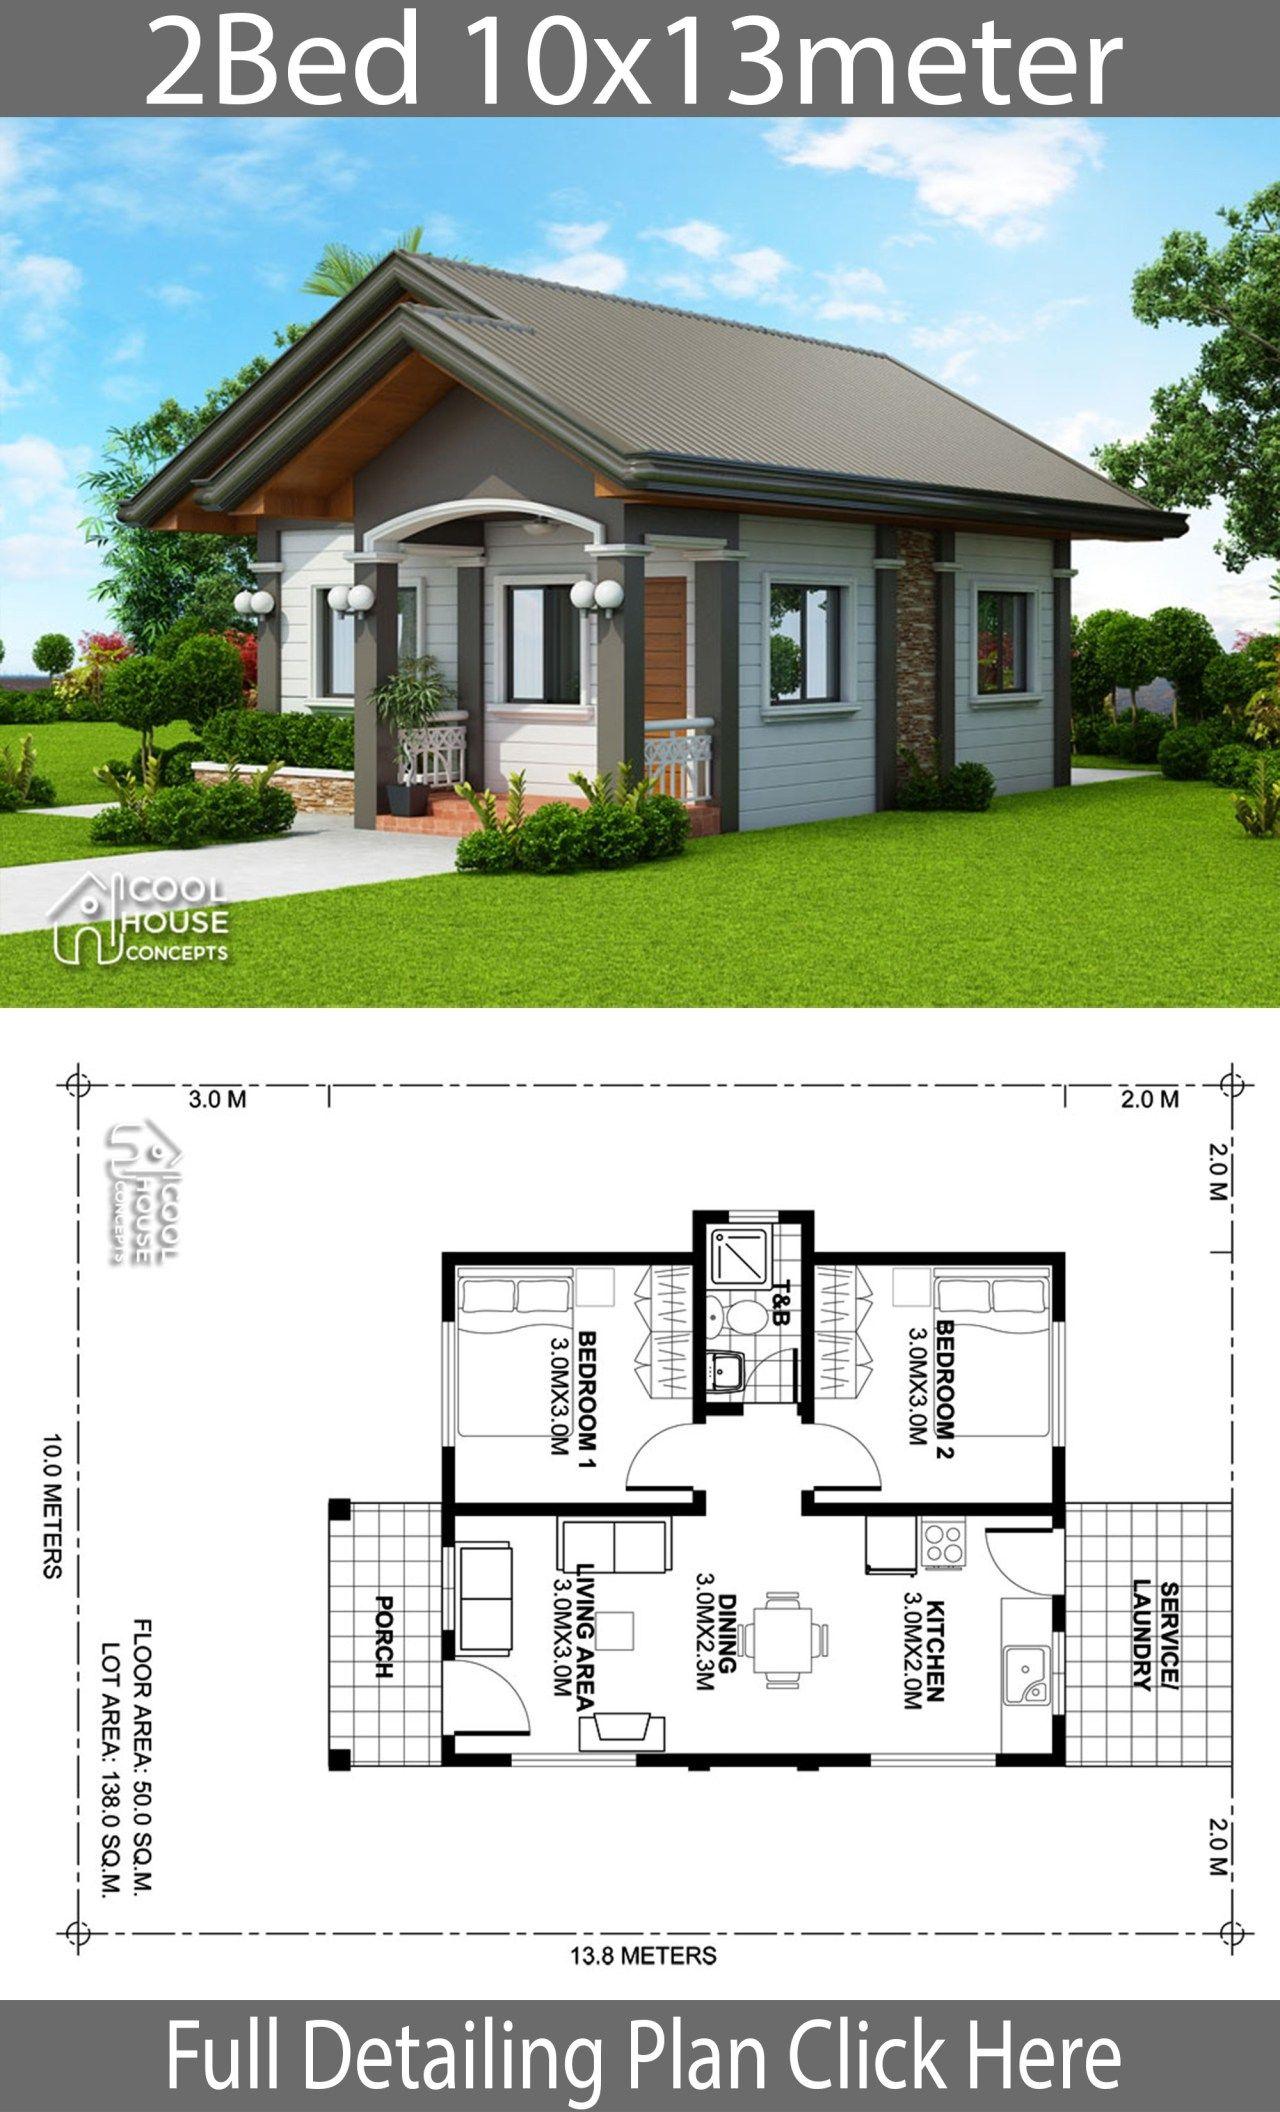 Home Design Plan 10x13m With 2 Bedrooms Home Ideas Simple House Design Modern House Plans Unique House Design